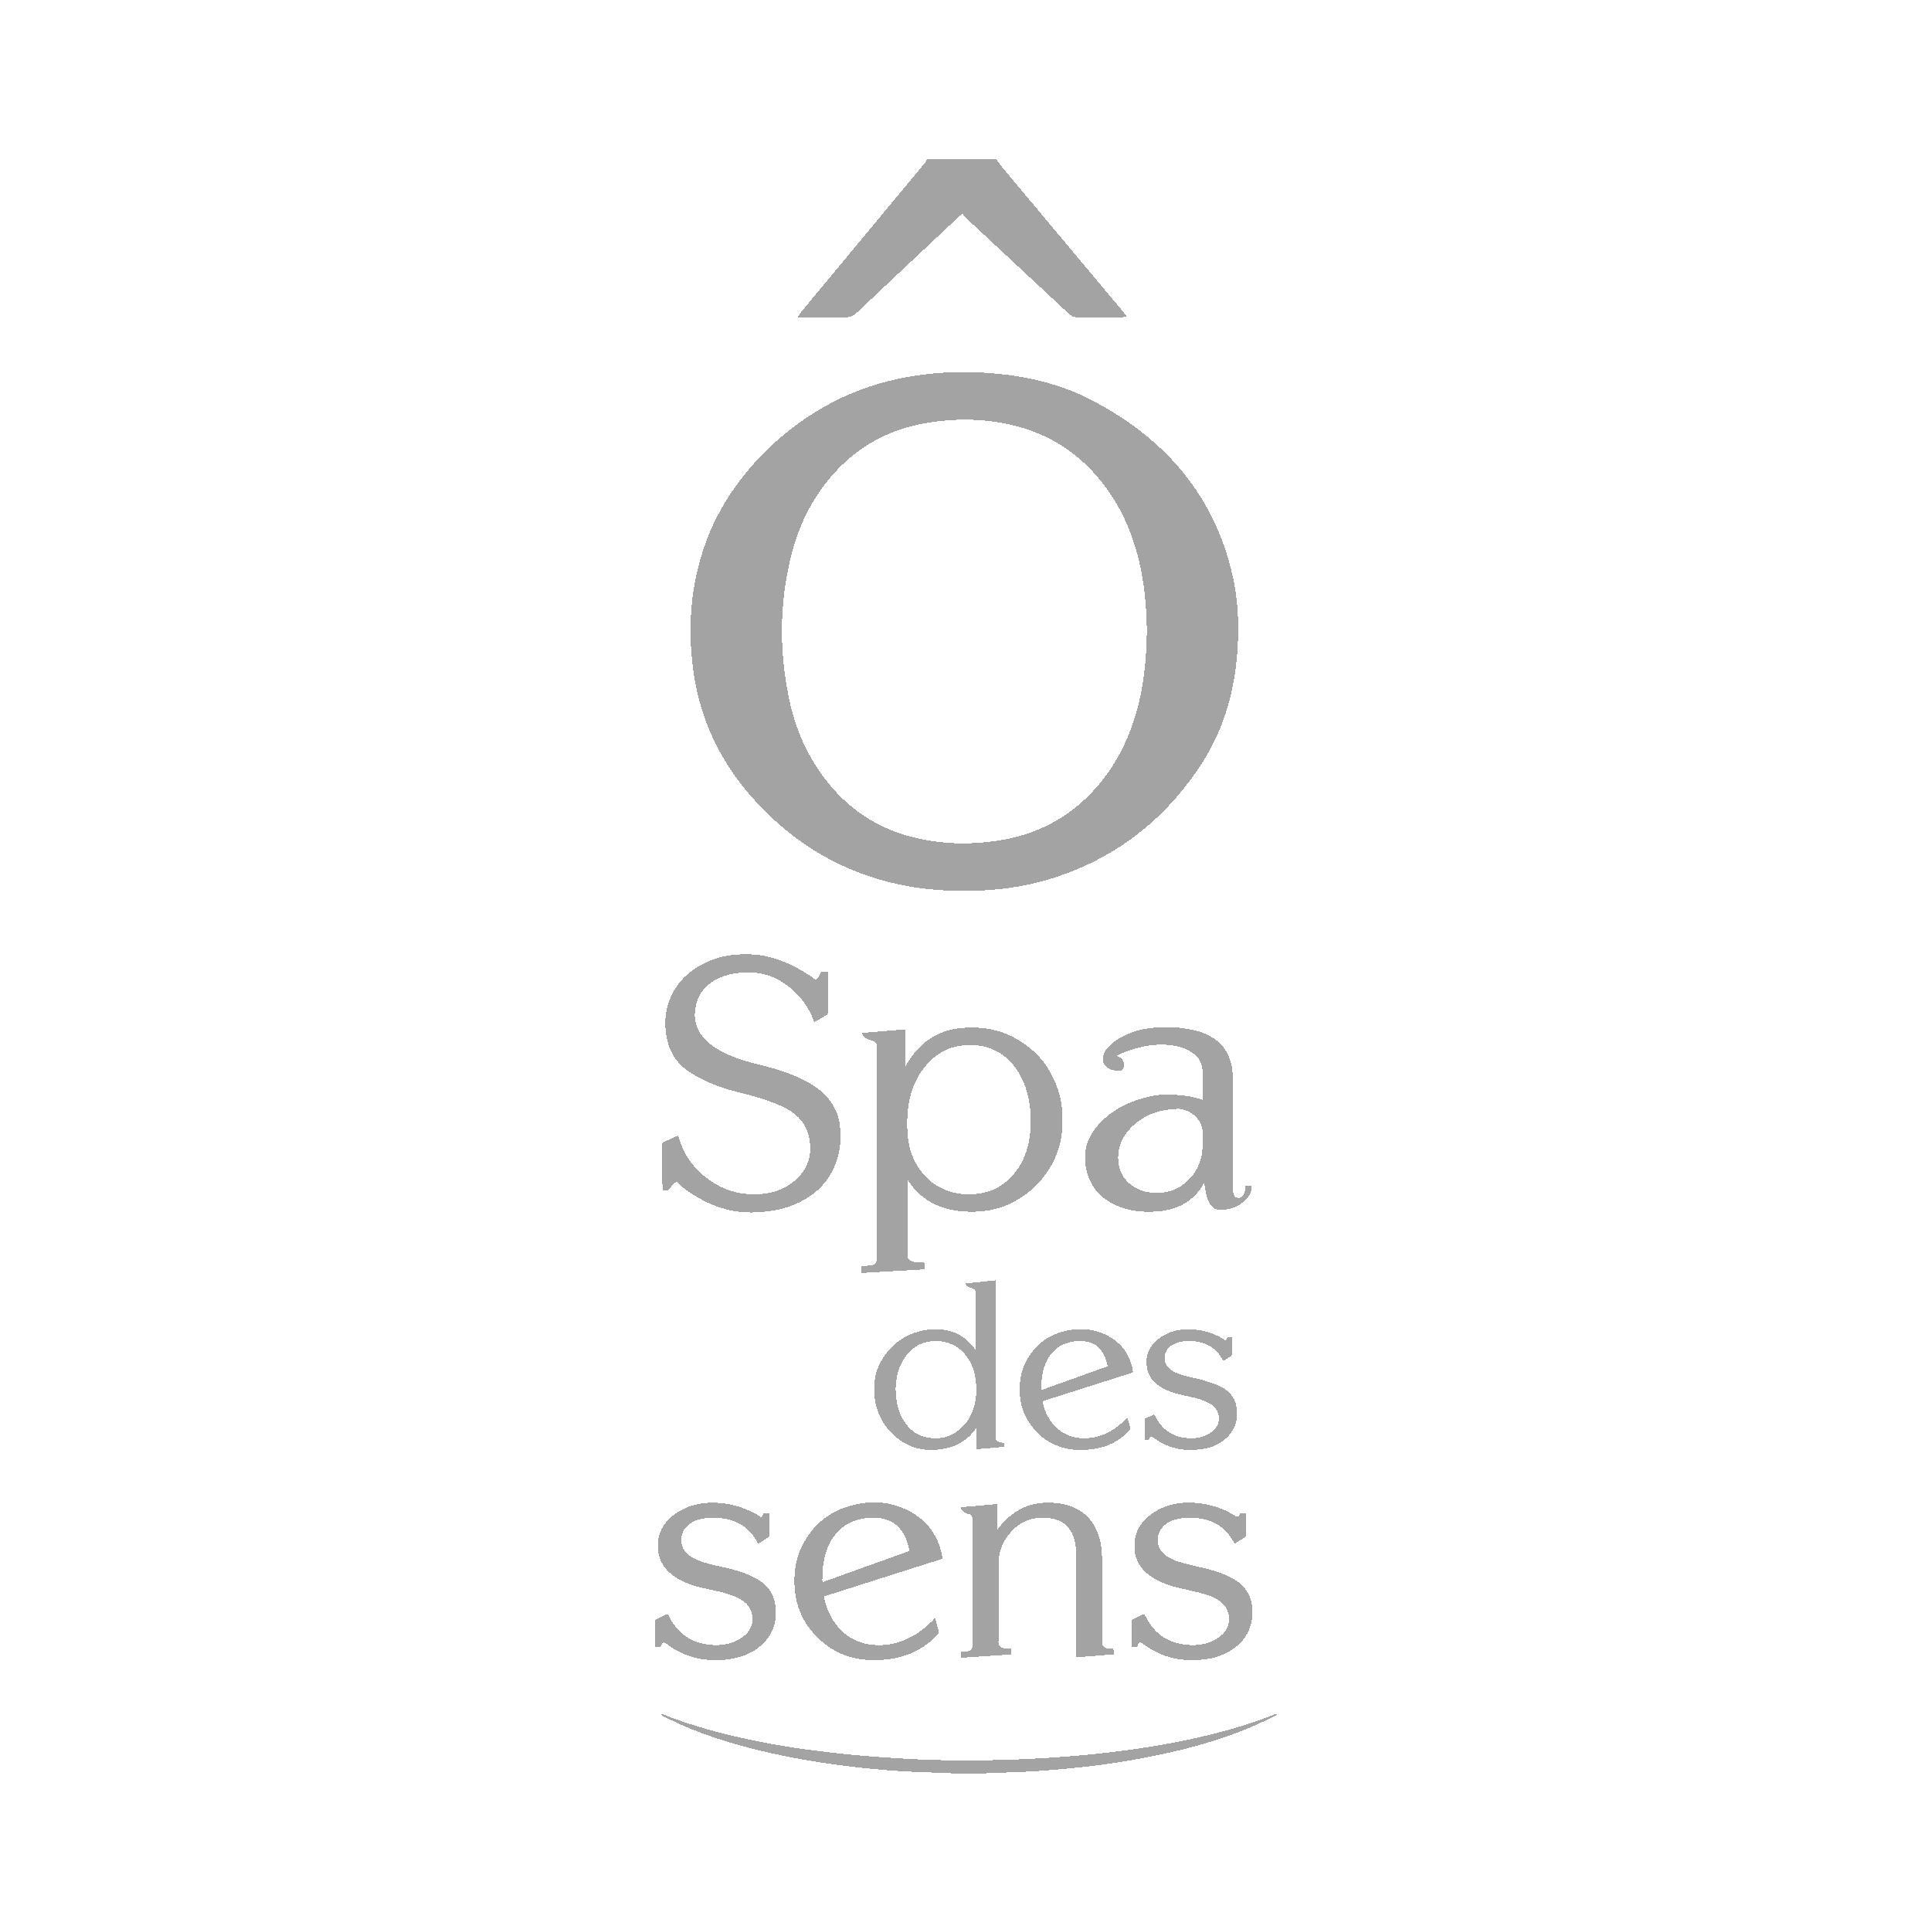 Breakout-company-agence-communication-logo-spa-des-sens-tarbes